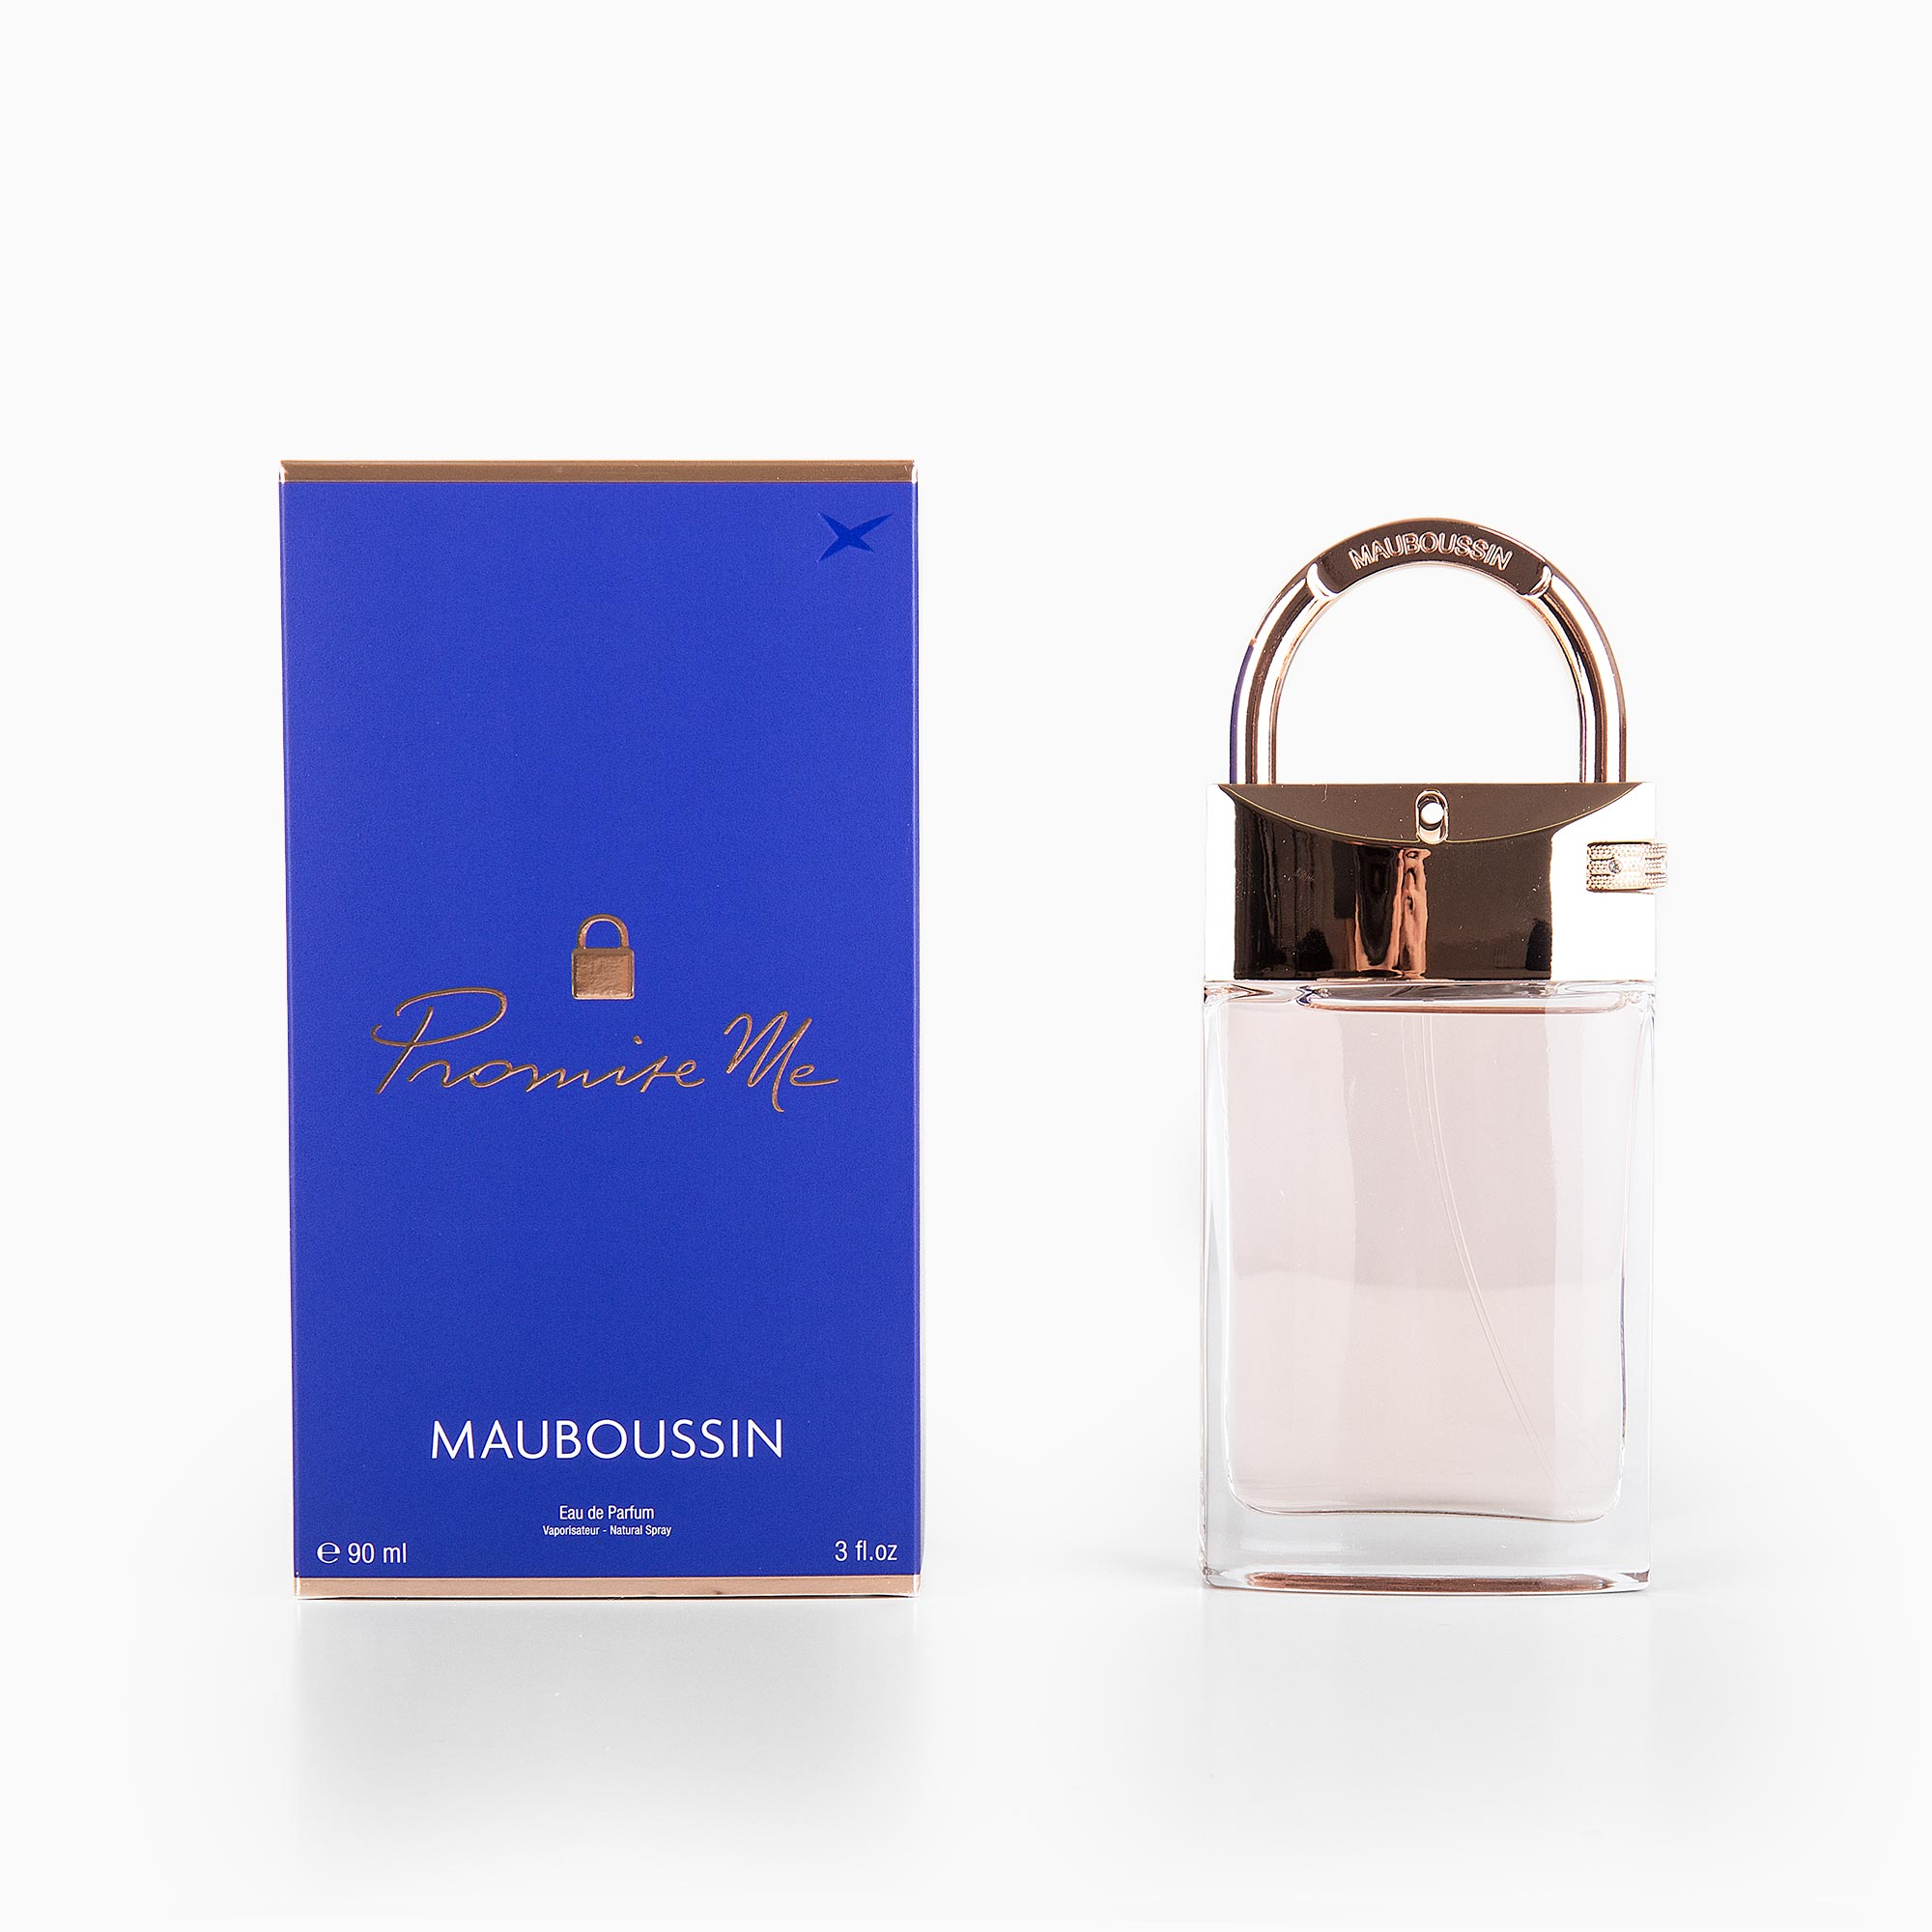 Mauboussin Eau De 90ml Femme Me Parfum Promise CxeWordB